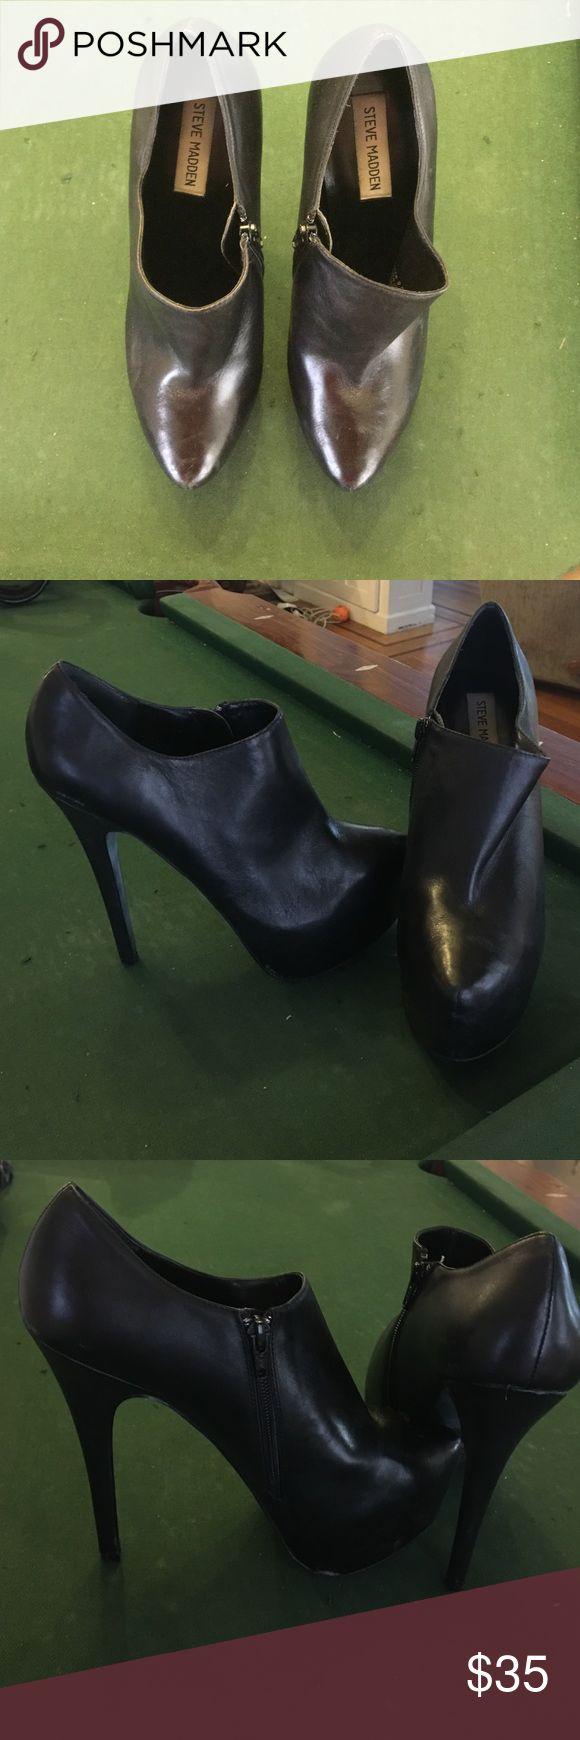 Steve Madden Vipper Black Leather Heels 6in black leather low ankle heel/bootie. Steve Madden Shoes Heels